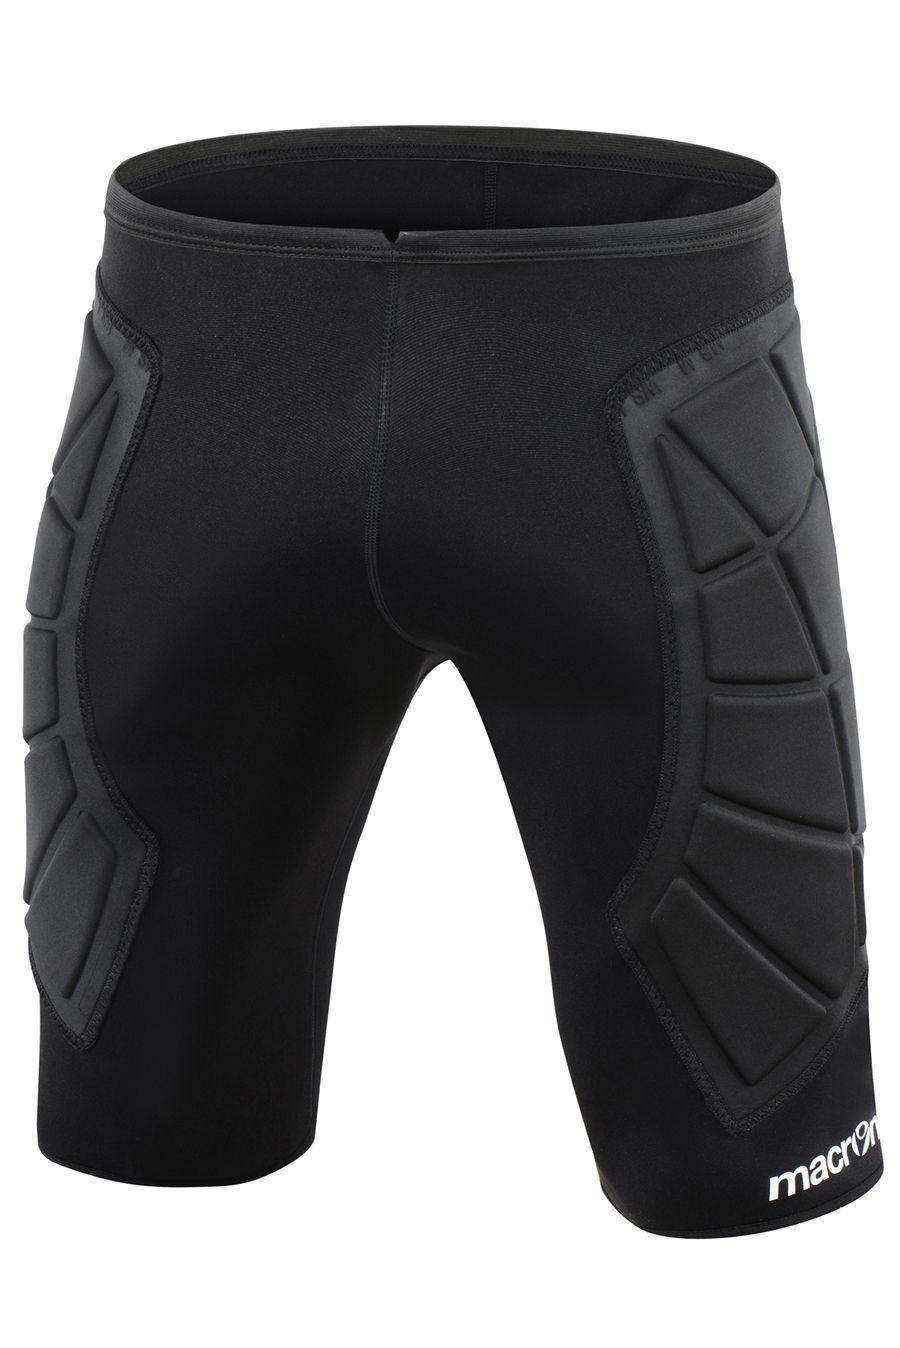 Pantalones cortos acolchado fútbol portero Scutum-Macron-tamaños de S a 2XL